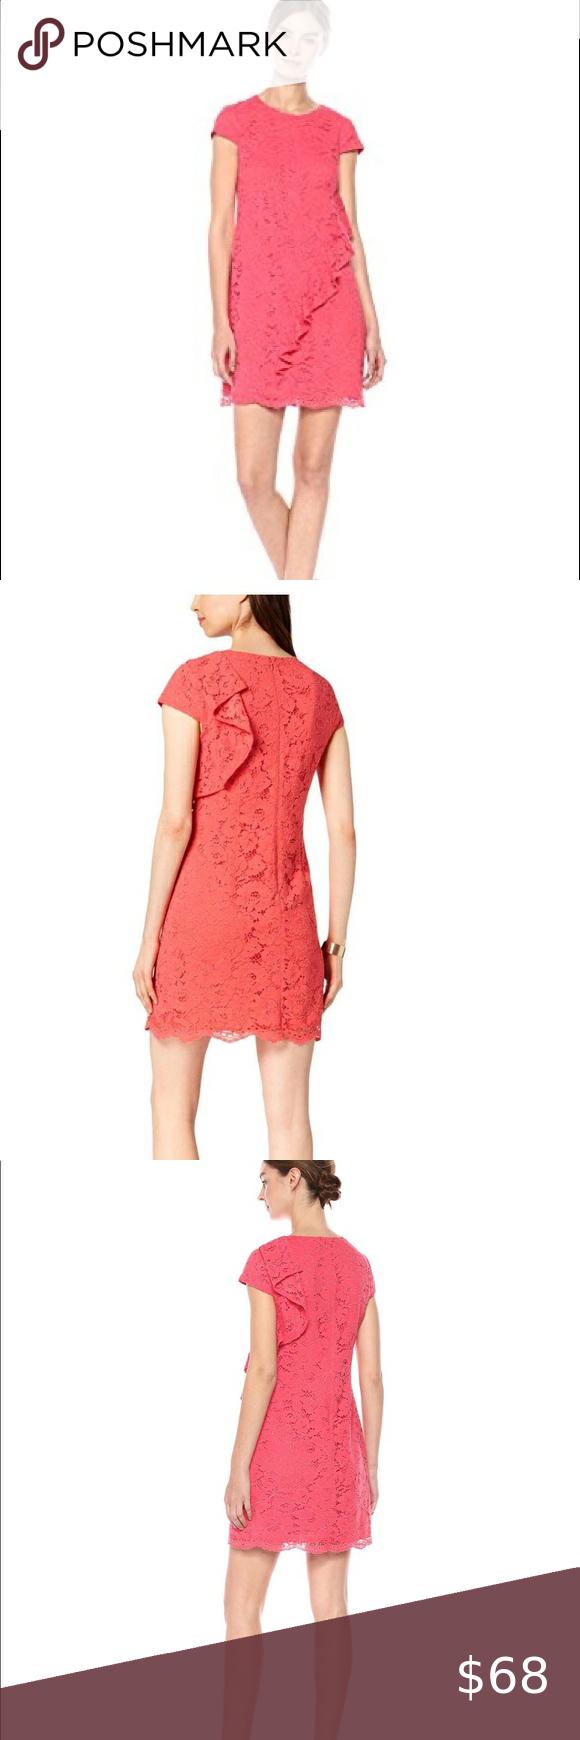 Vince Camuto Women S Lace Ruffle Shift Dress Lace Shift Dress Red Holiday Dress Chiffon Midi Dress [ 1740 x 580 Pixel ]